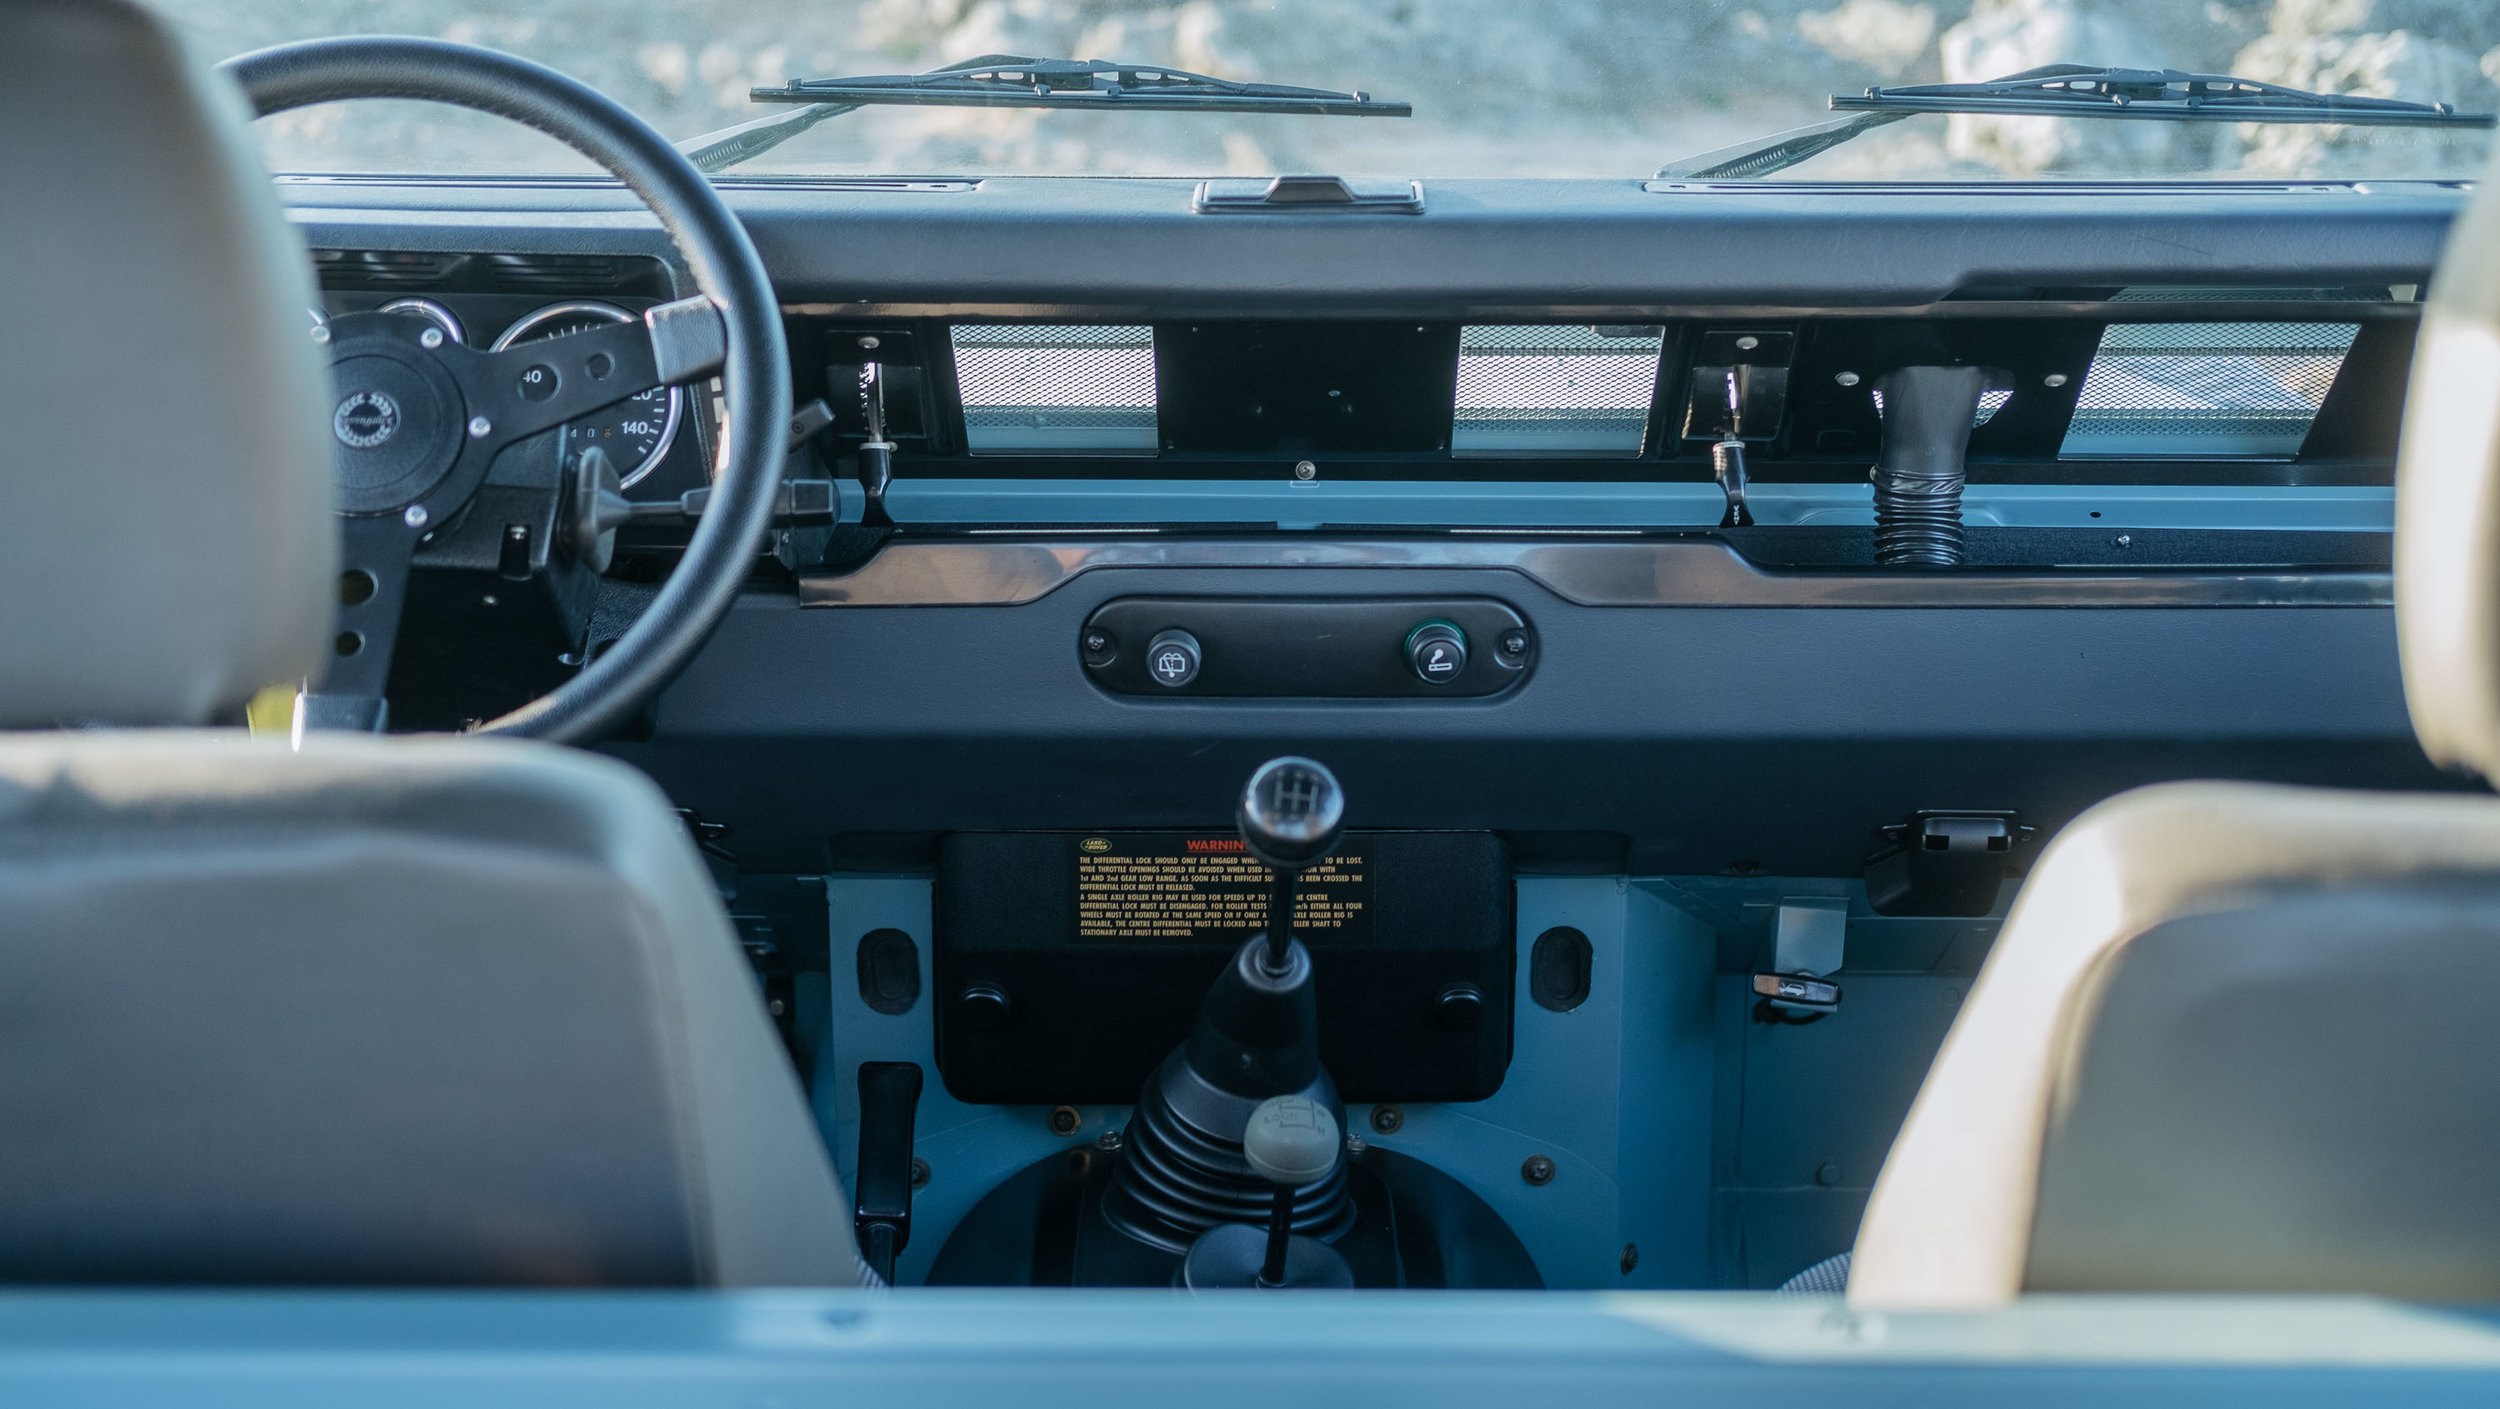 coolnvintage Land Rover Defender (51 of 98).jpg